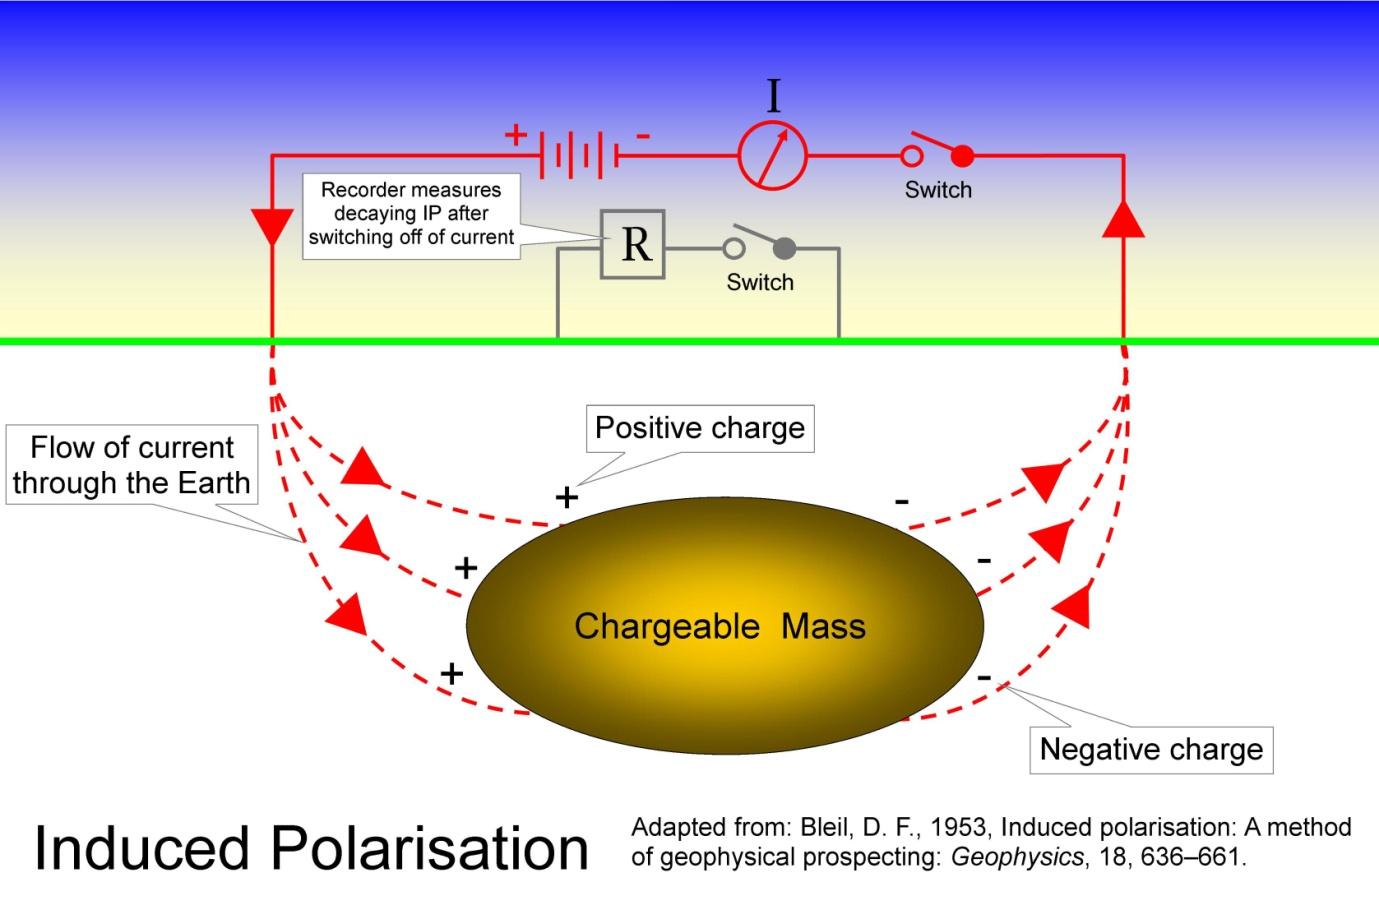 resistivity and induced polarisation surveys